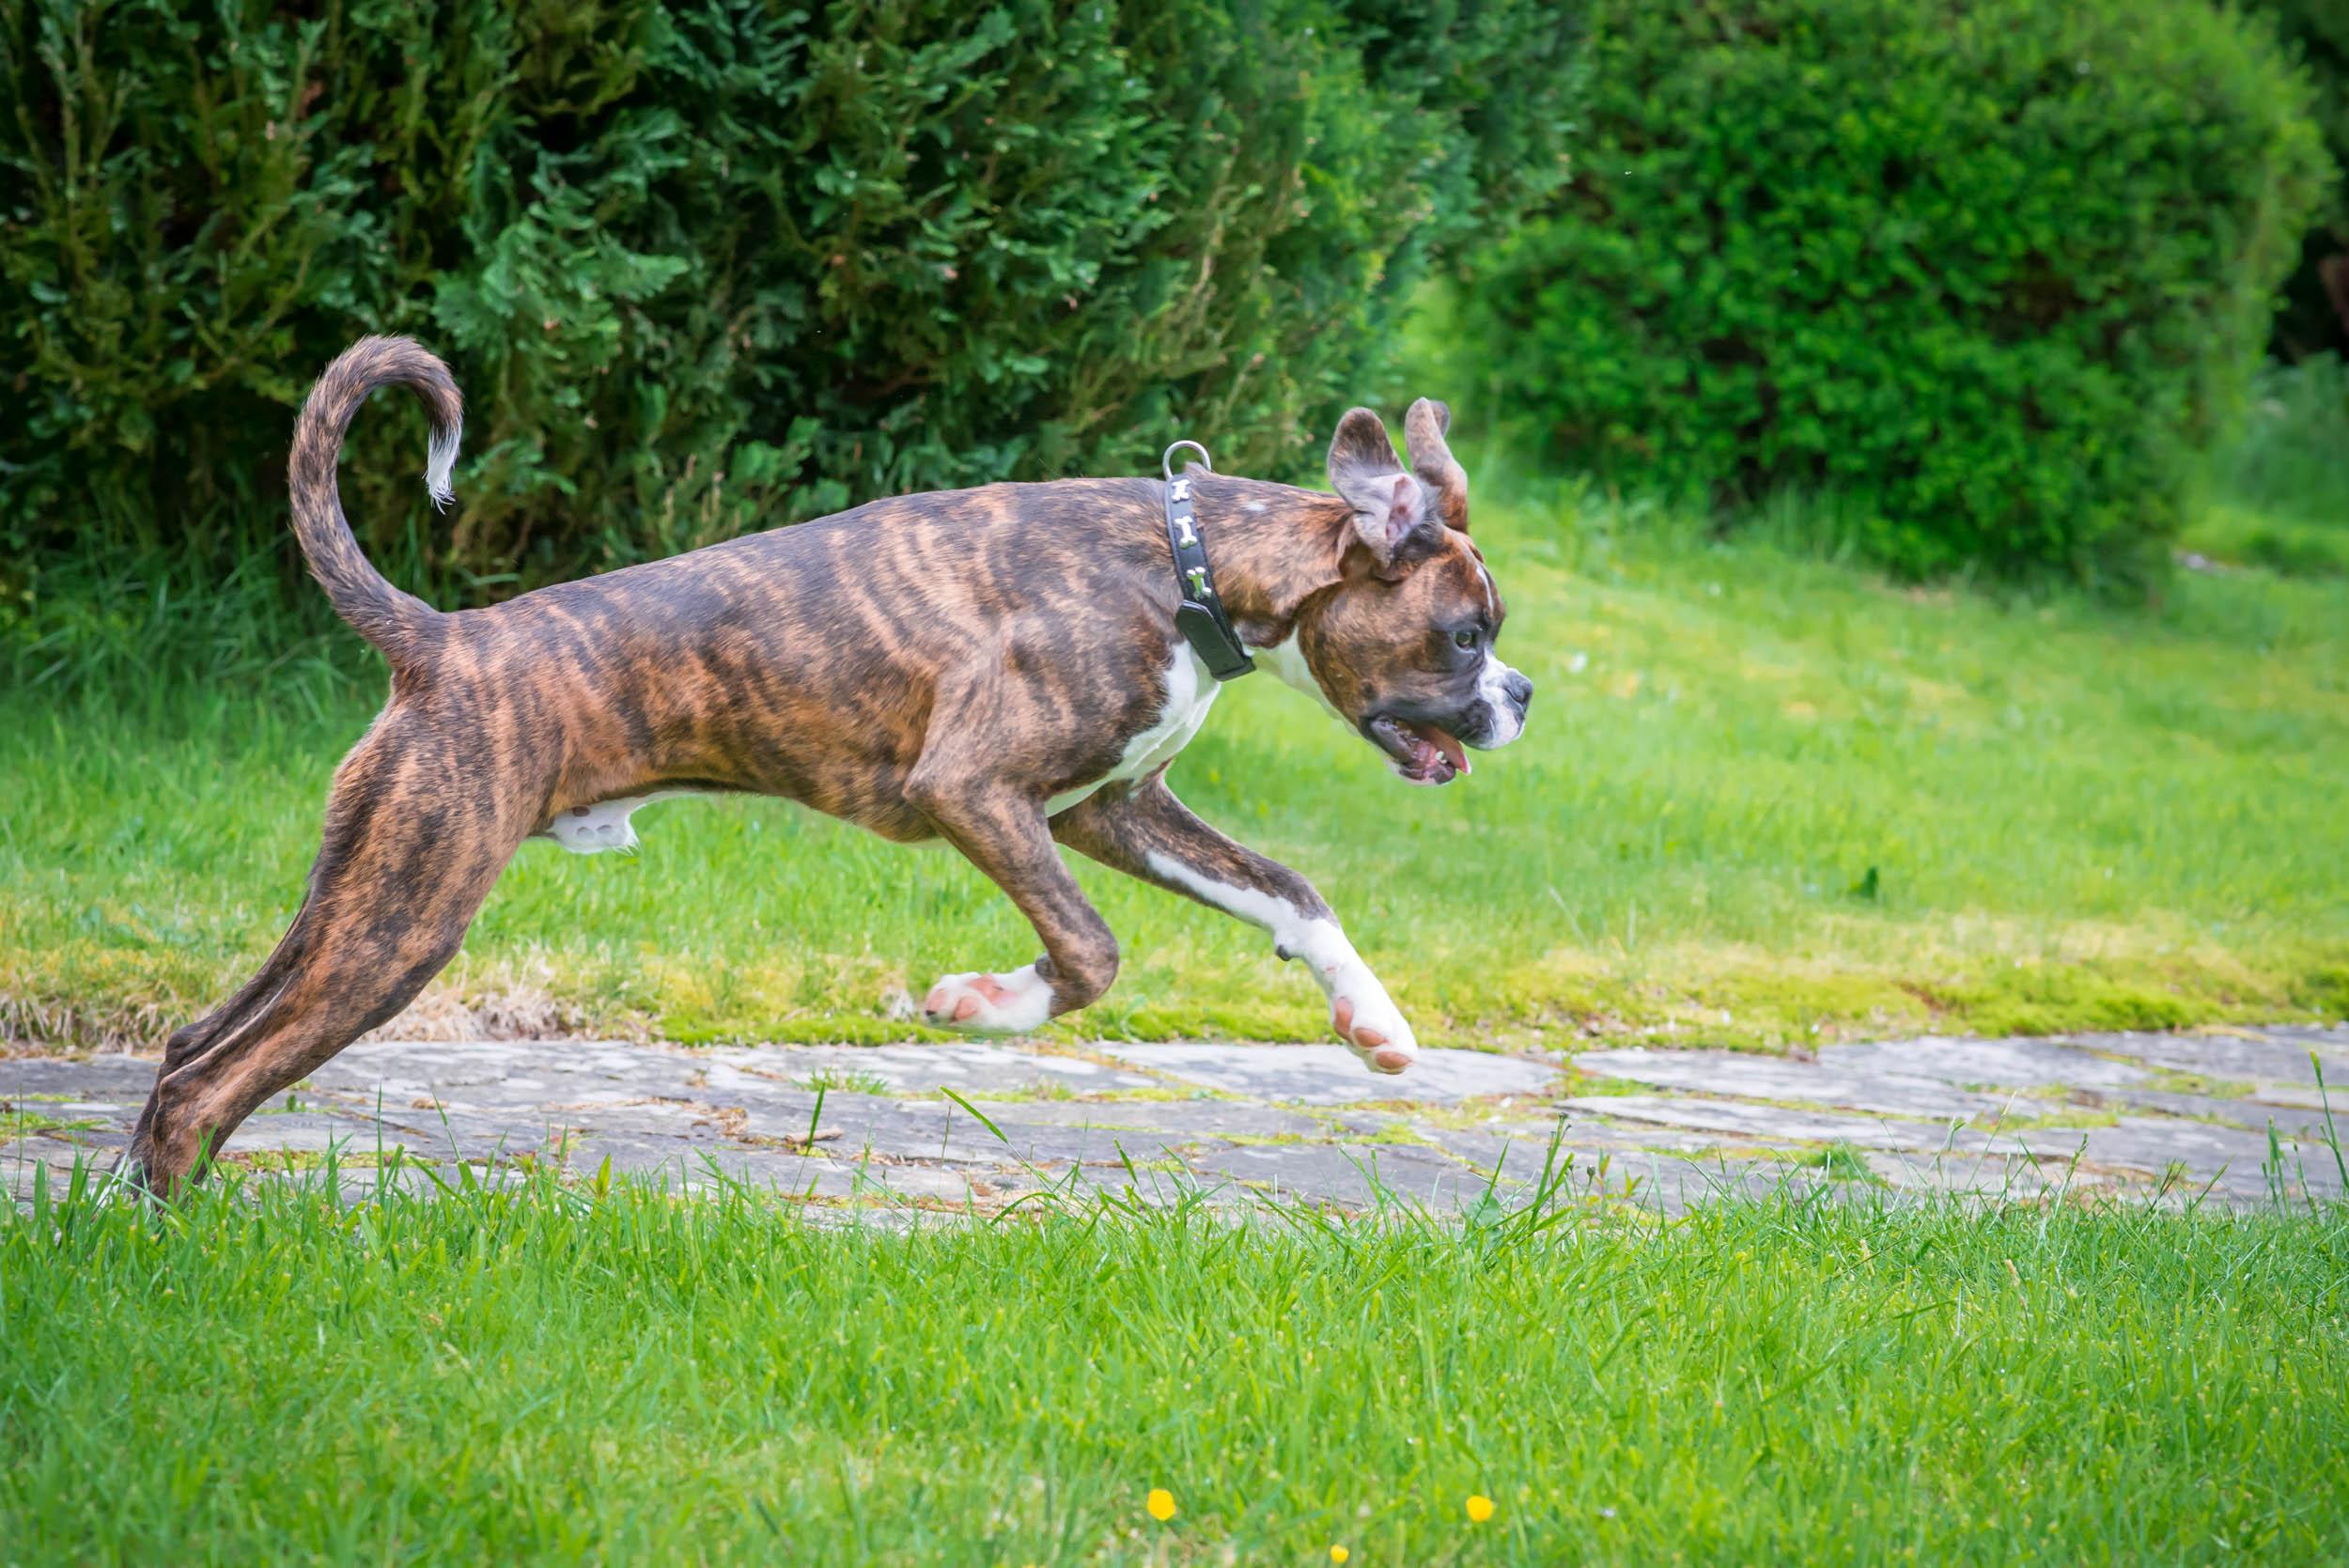 Dogs-4882.jpg